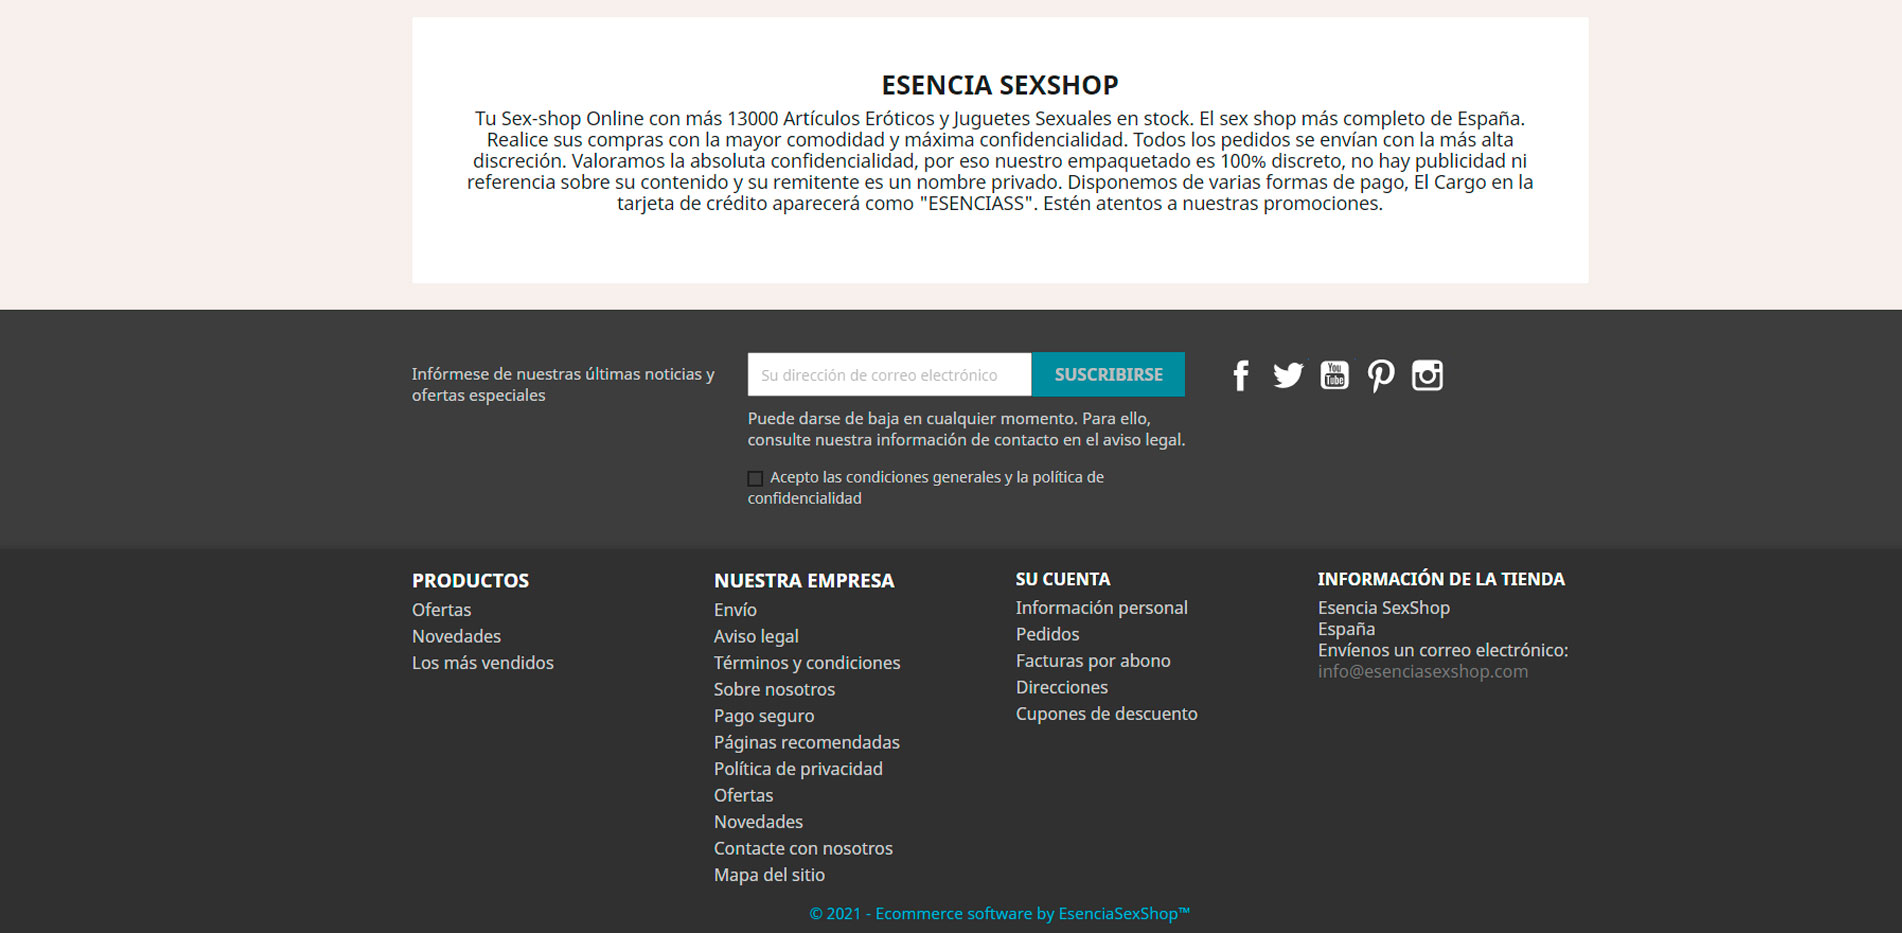 Captura-de-pantalla-Esencia-SexShop-2